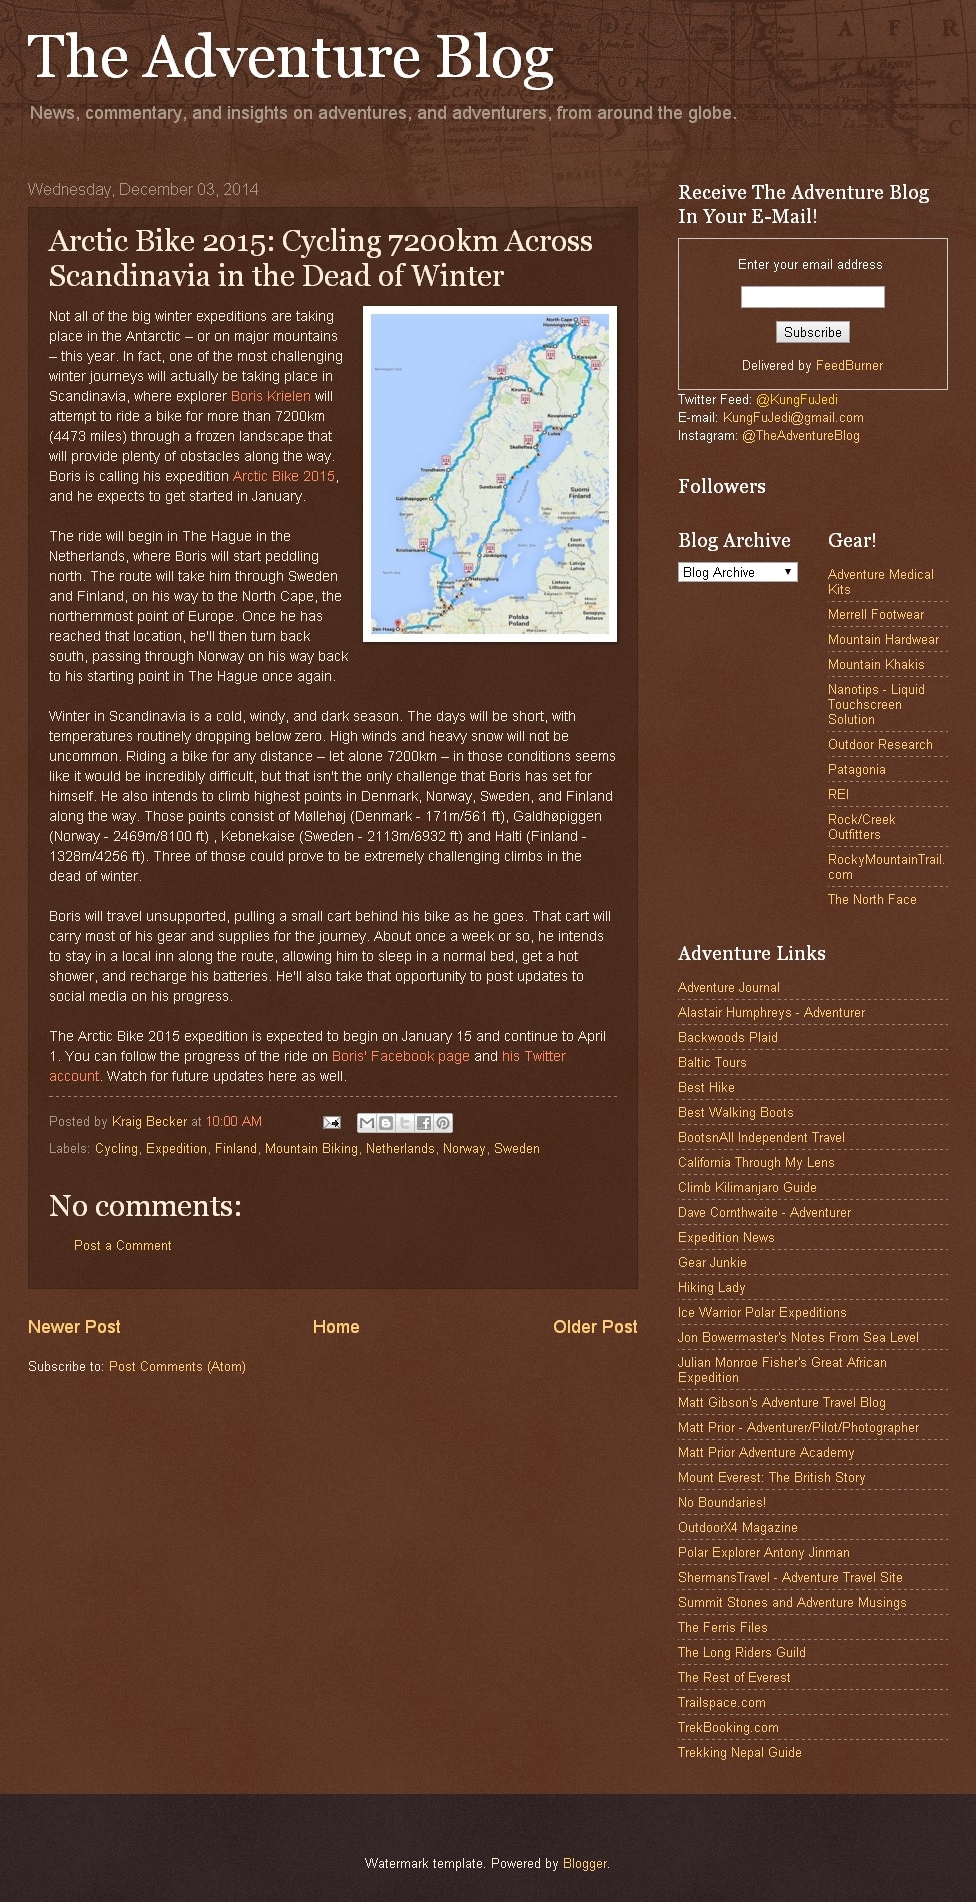 noordkaap_20141203_theadventureblog